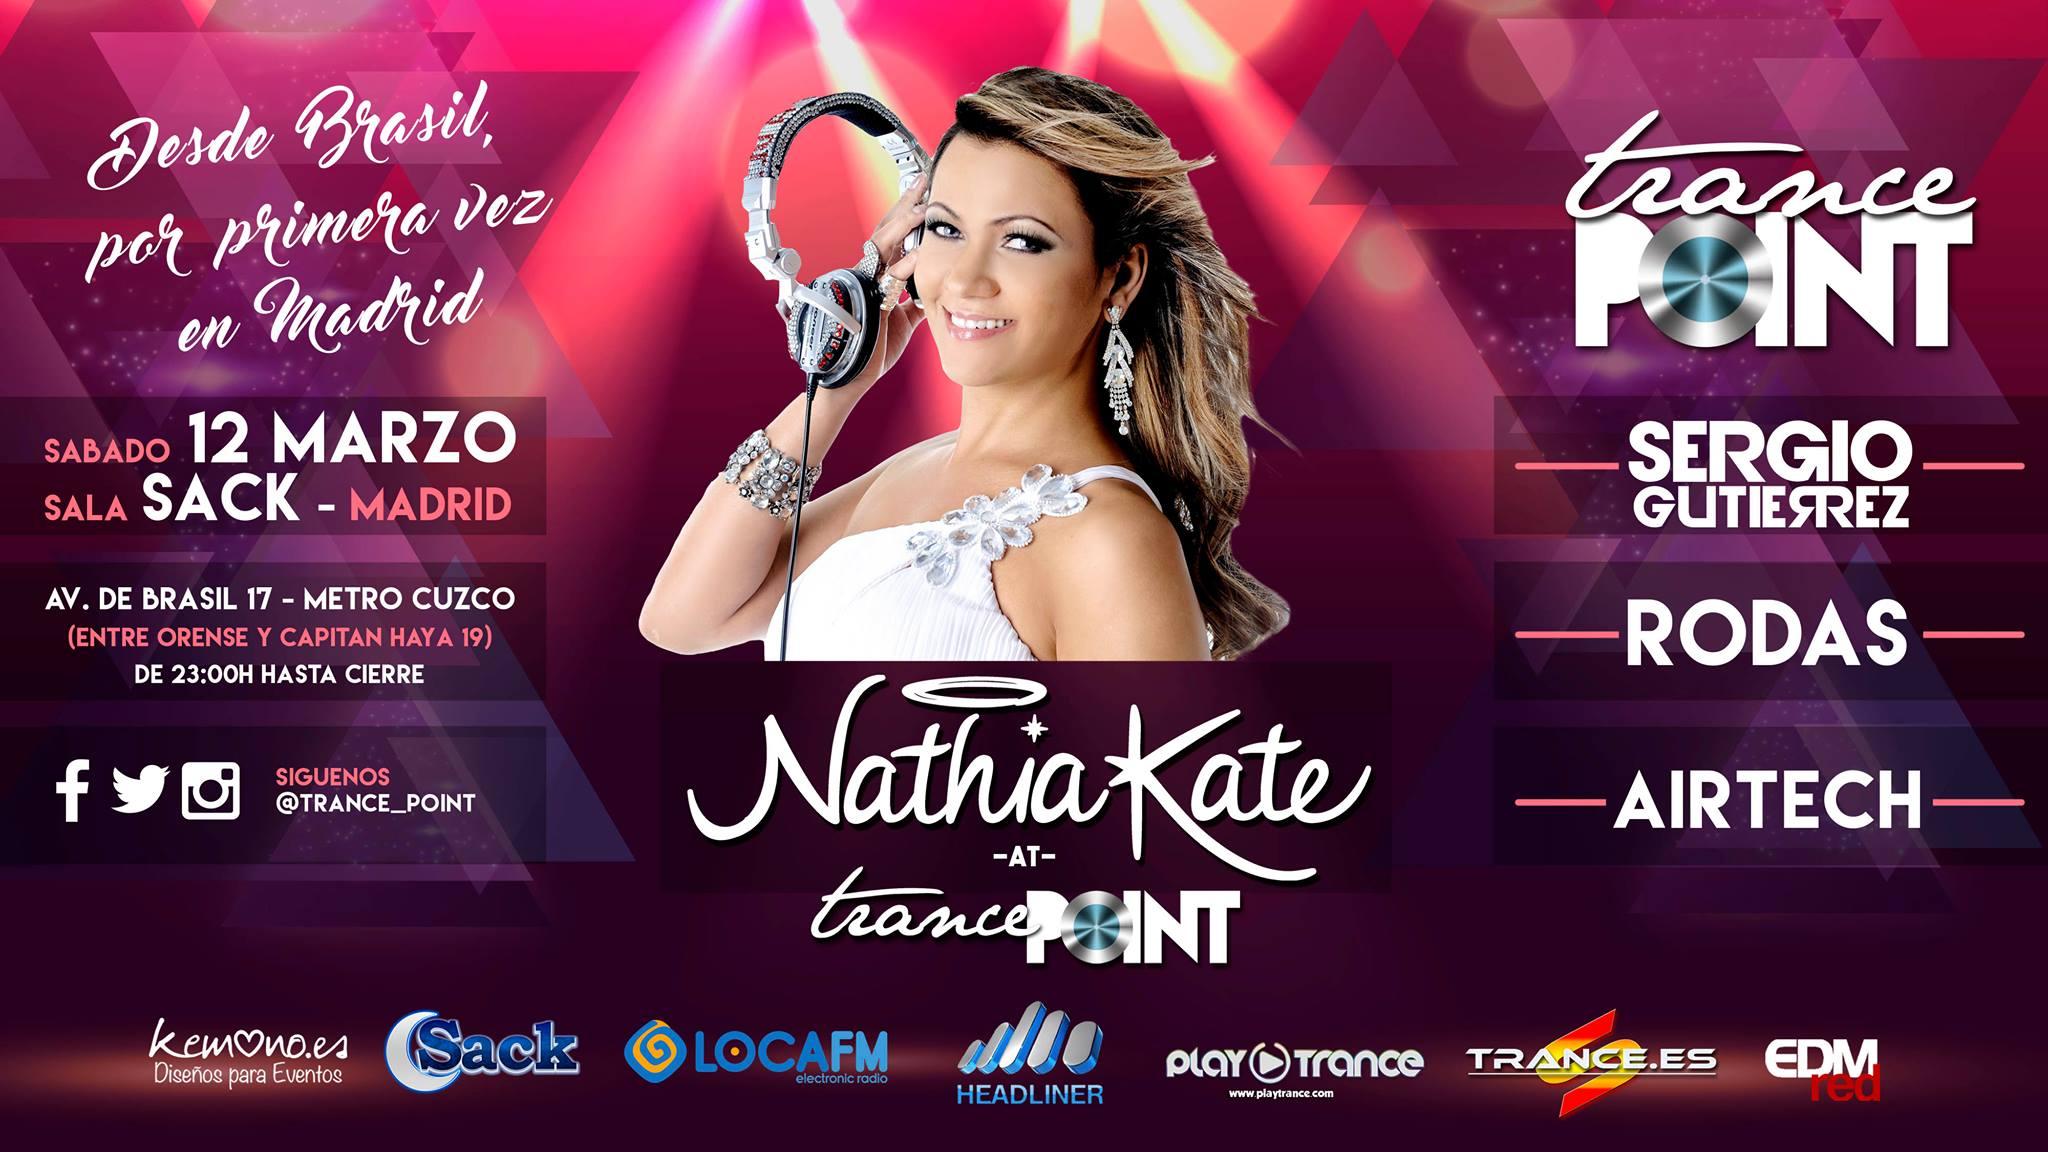 Trance Point trae a Nathia Kate a Madrid